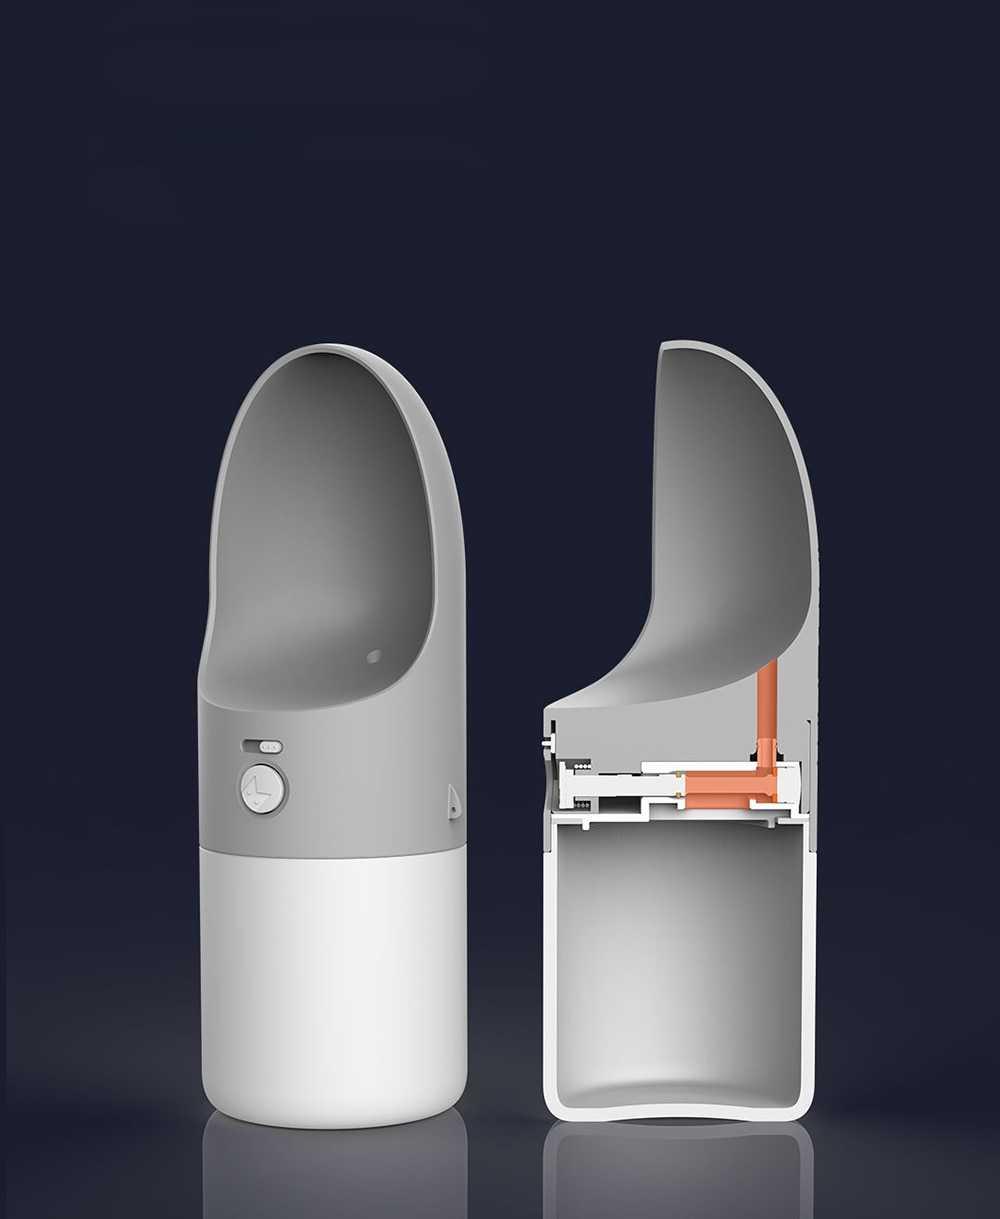 Moestar Rocket Multi-Functional Portable Bottle Orange/Grey